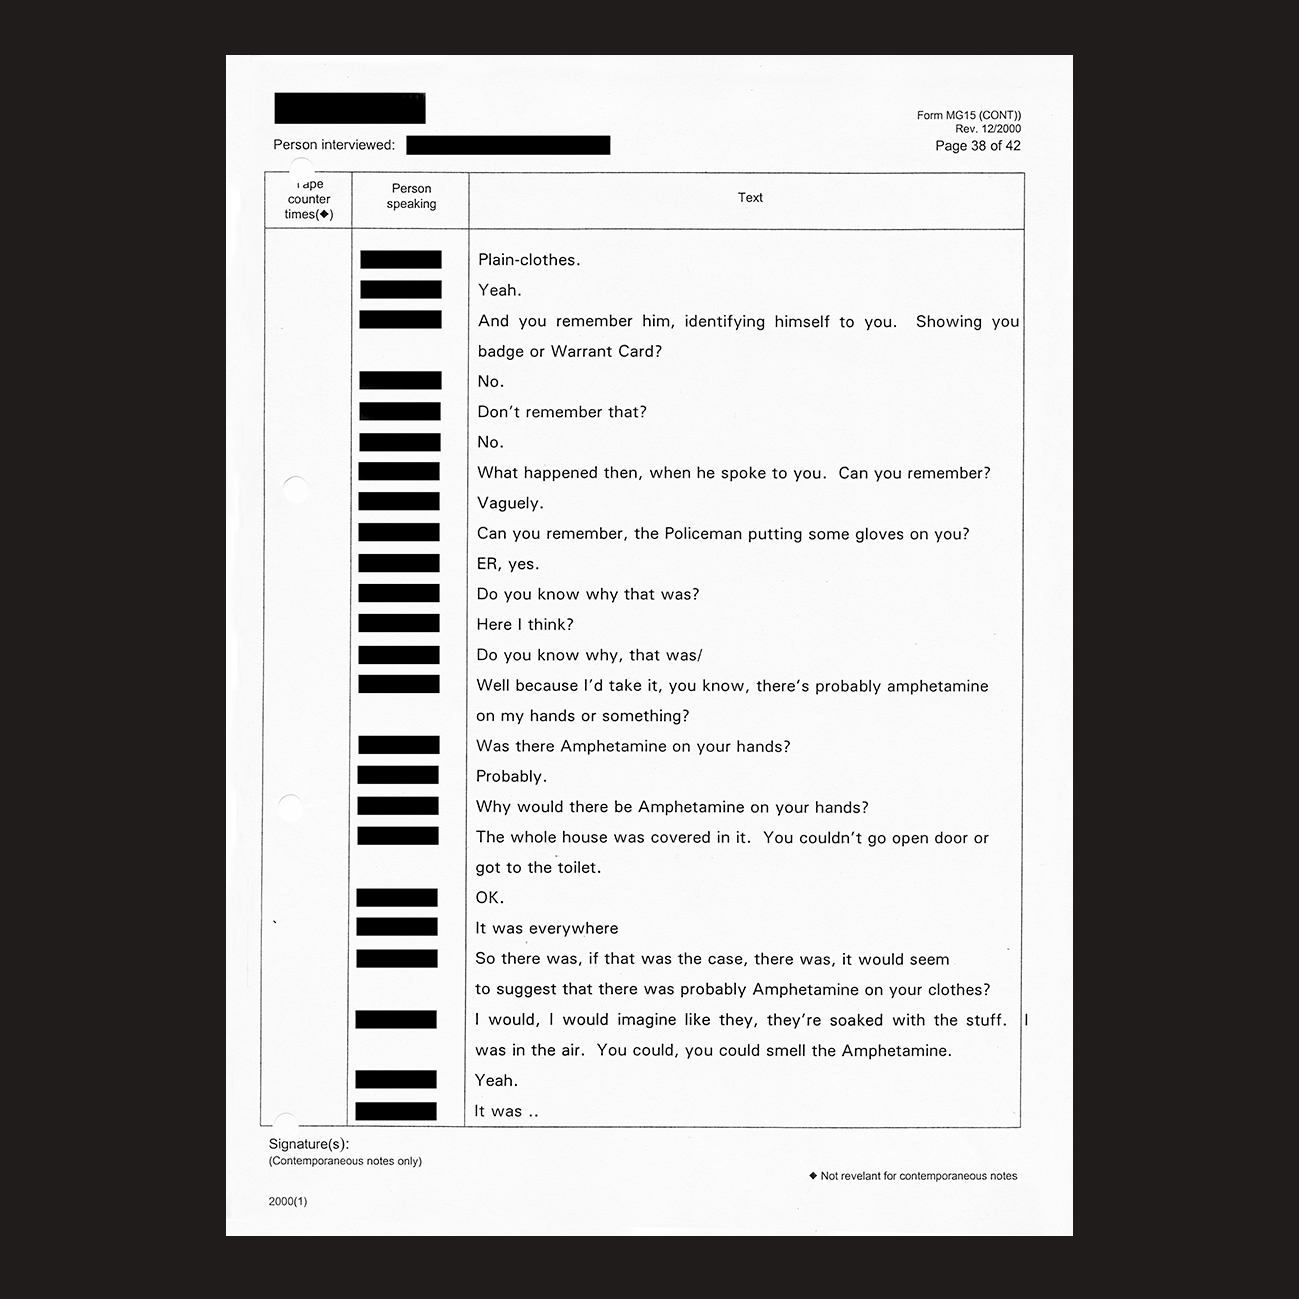 JM Bail 147 - Interview 9 - Amphetamine Everywhere.jpg